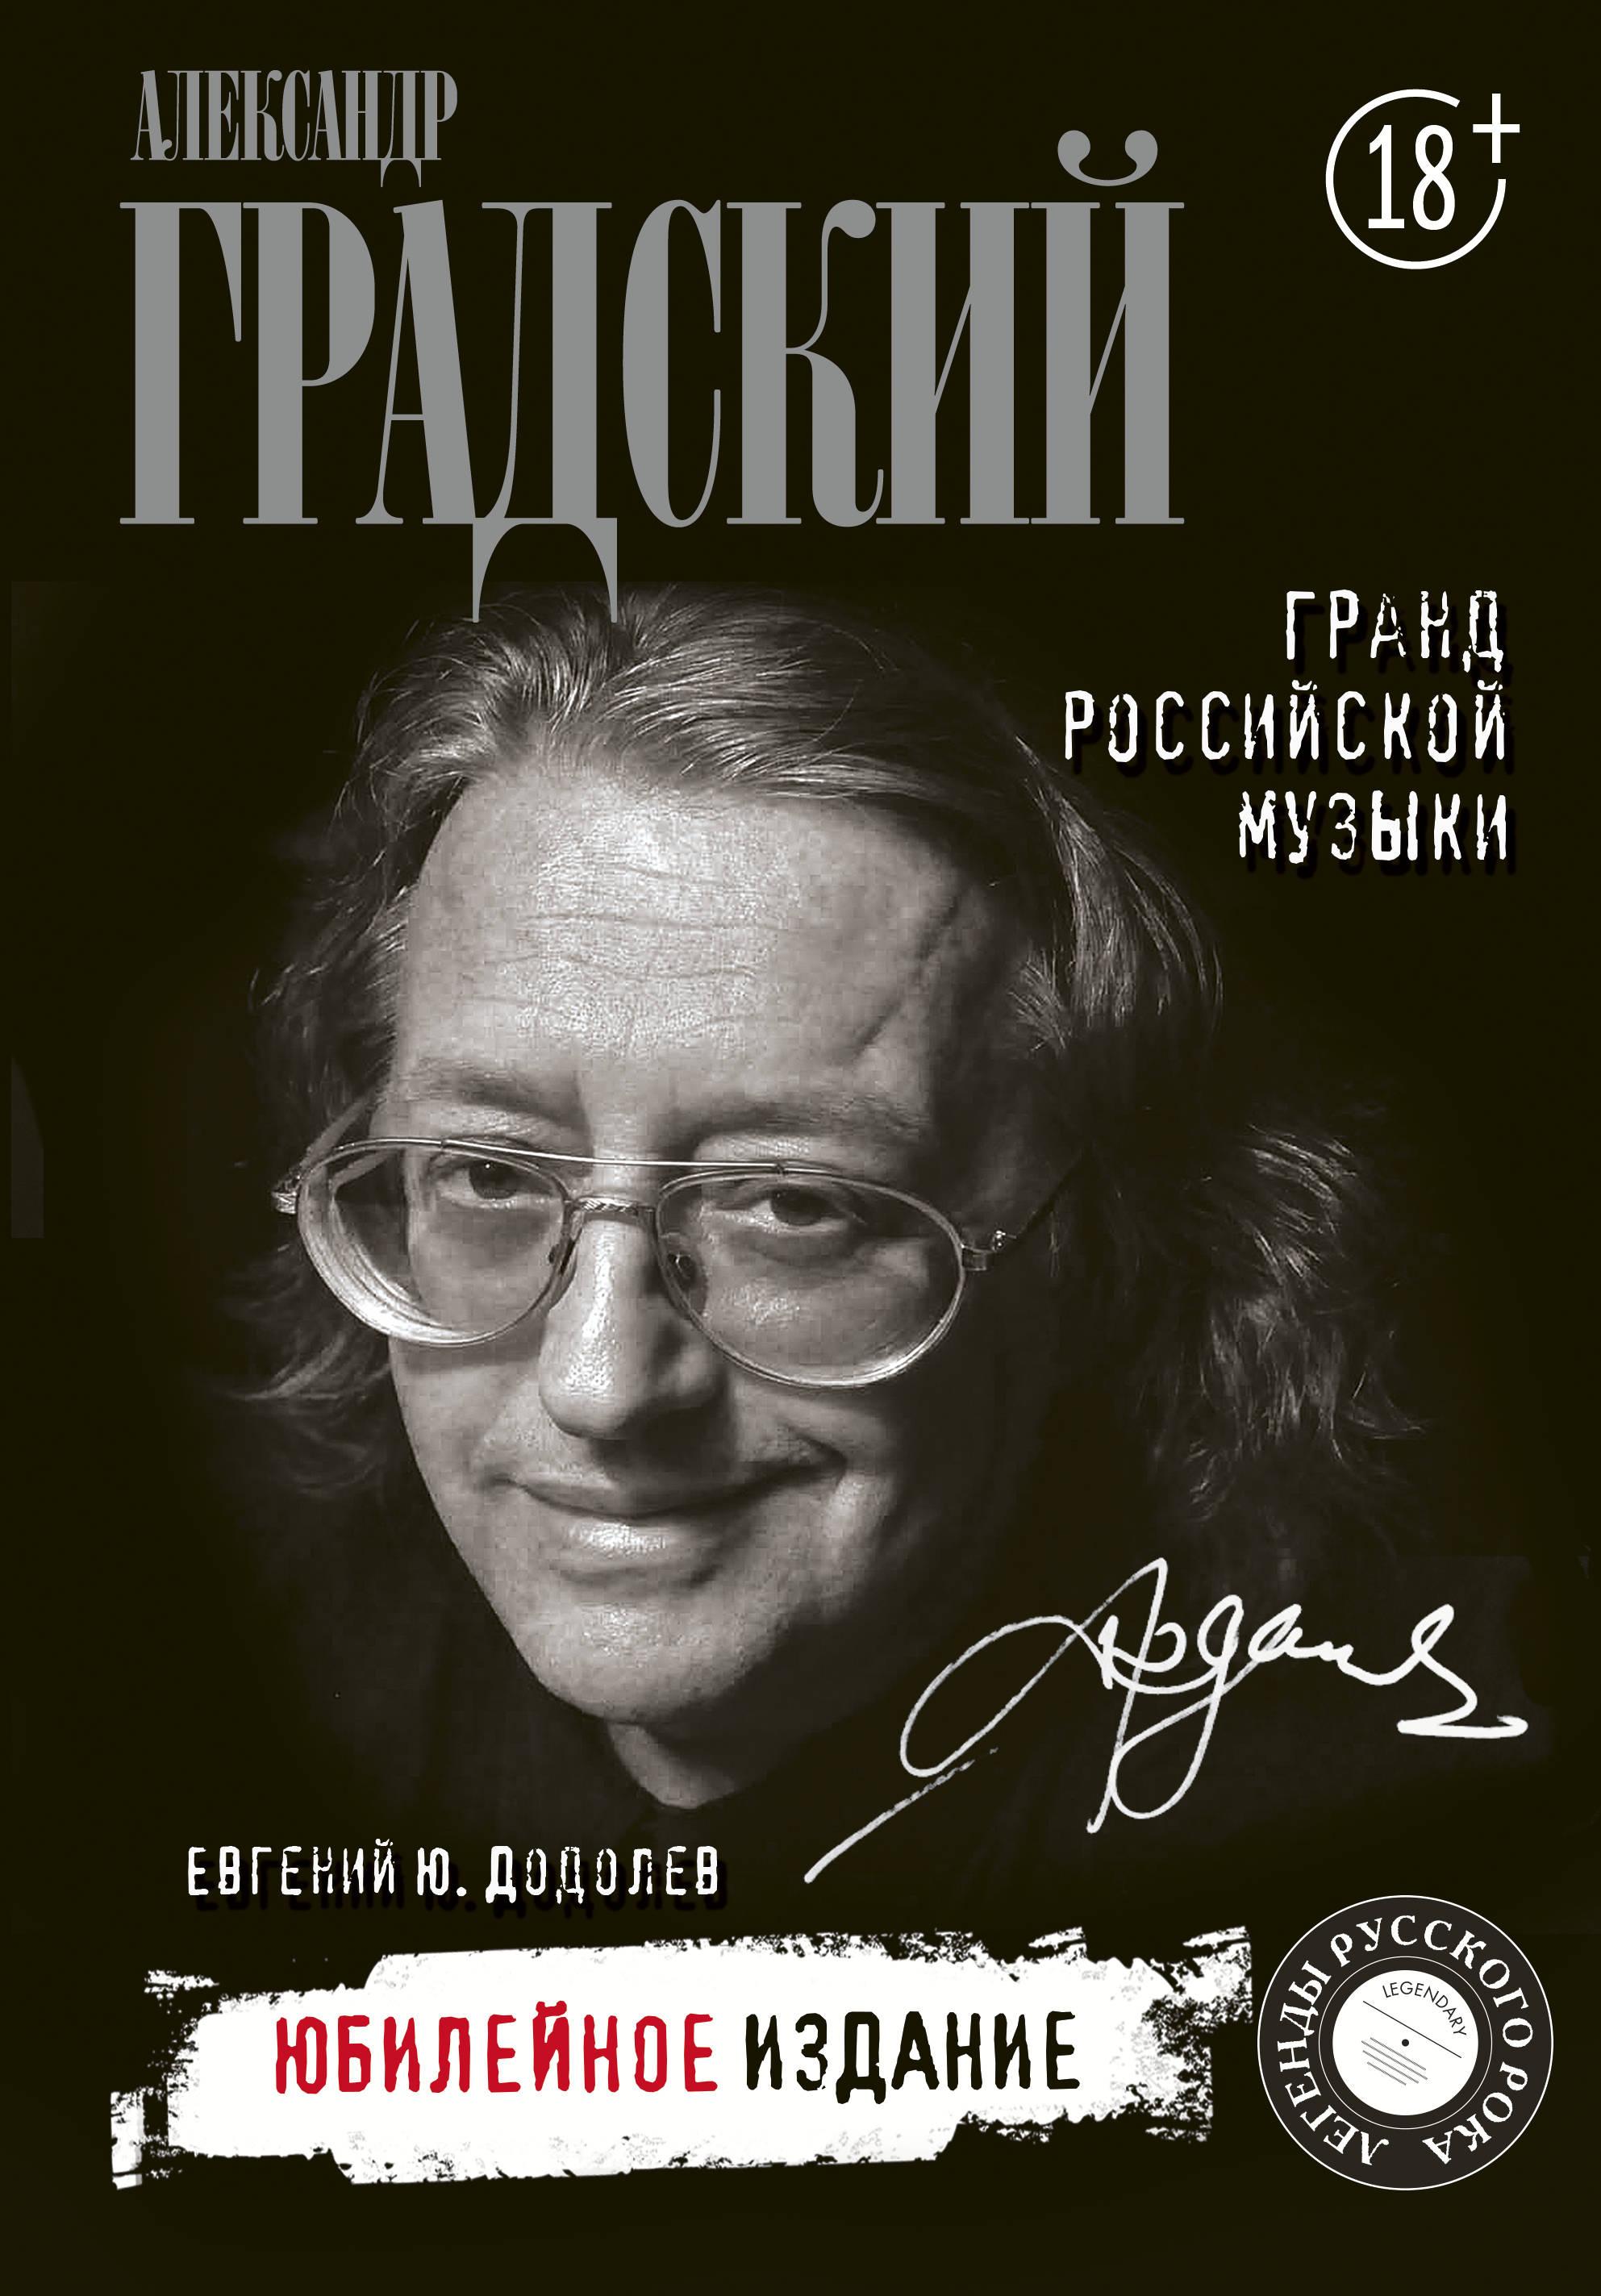 Aleksandr Gradskij. Grand rossijskoj muzyki